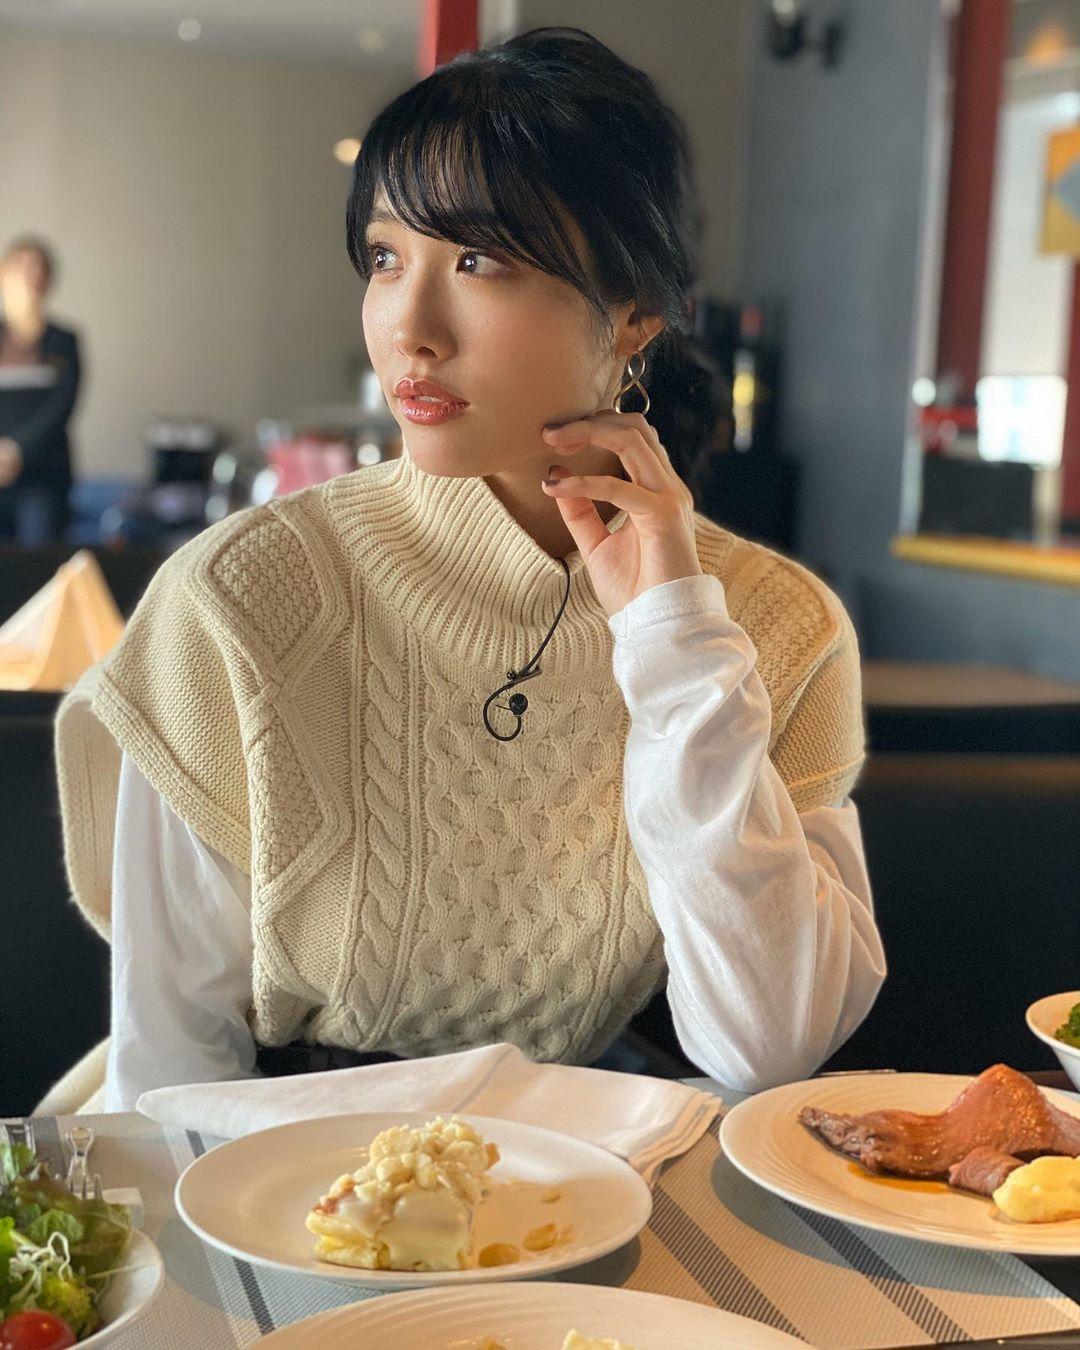 konno_anna241.jpg